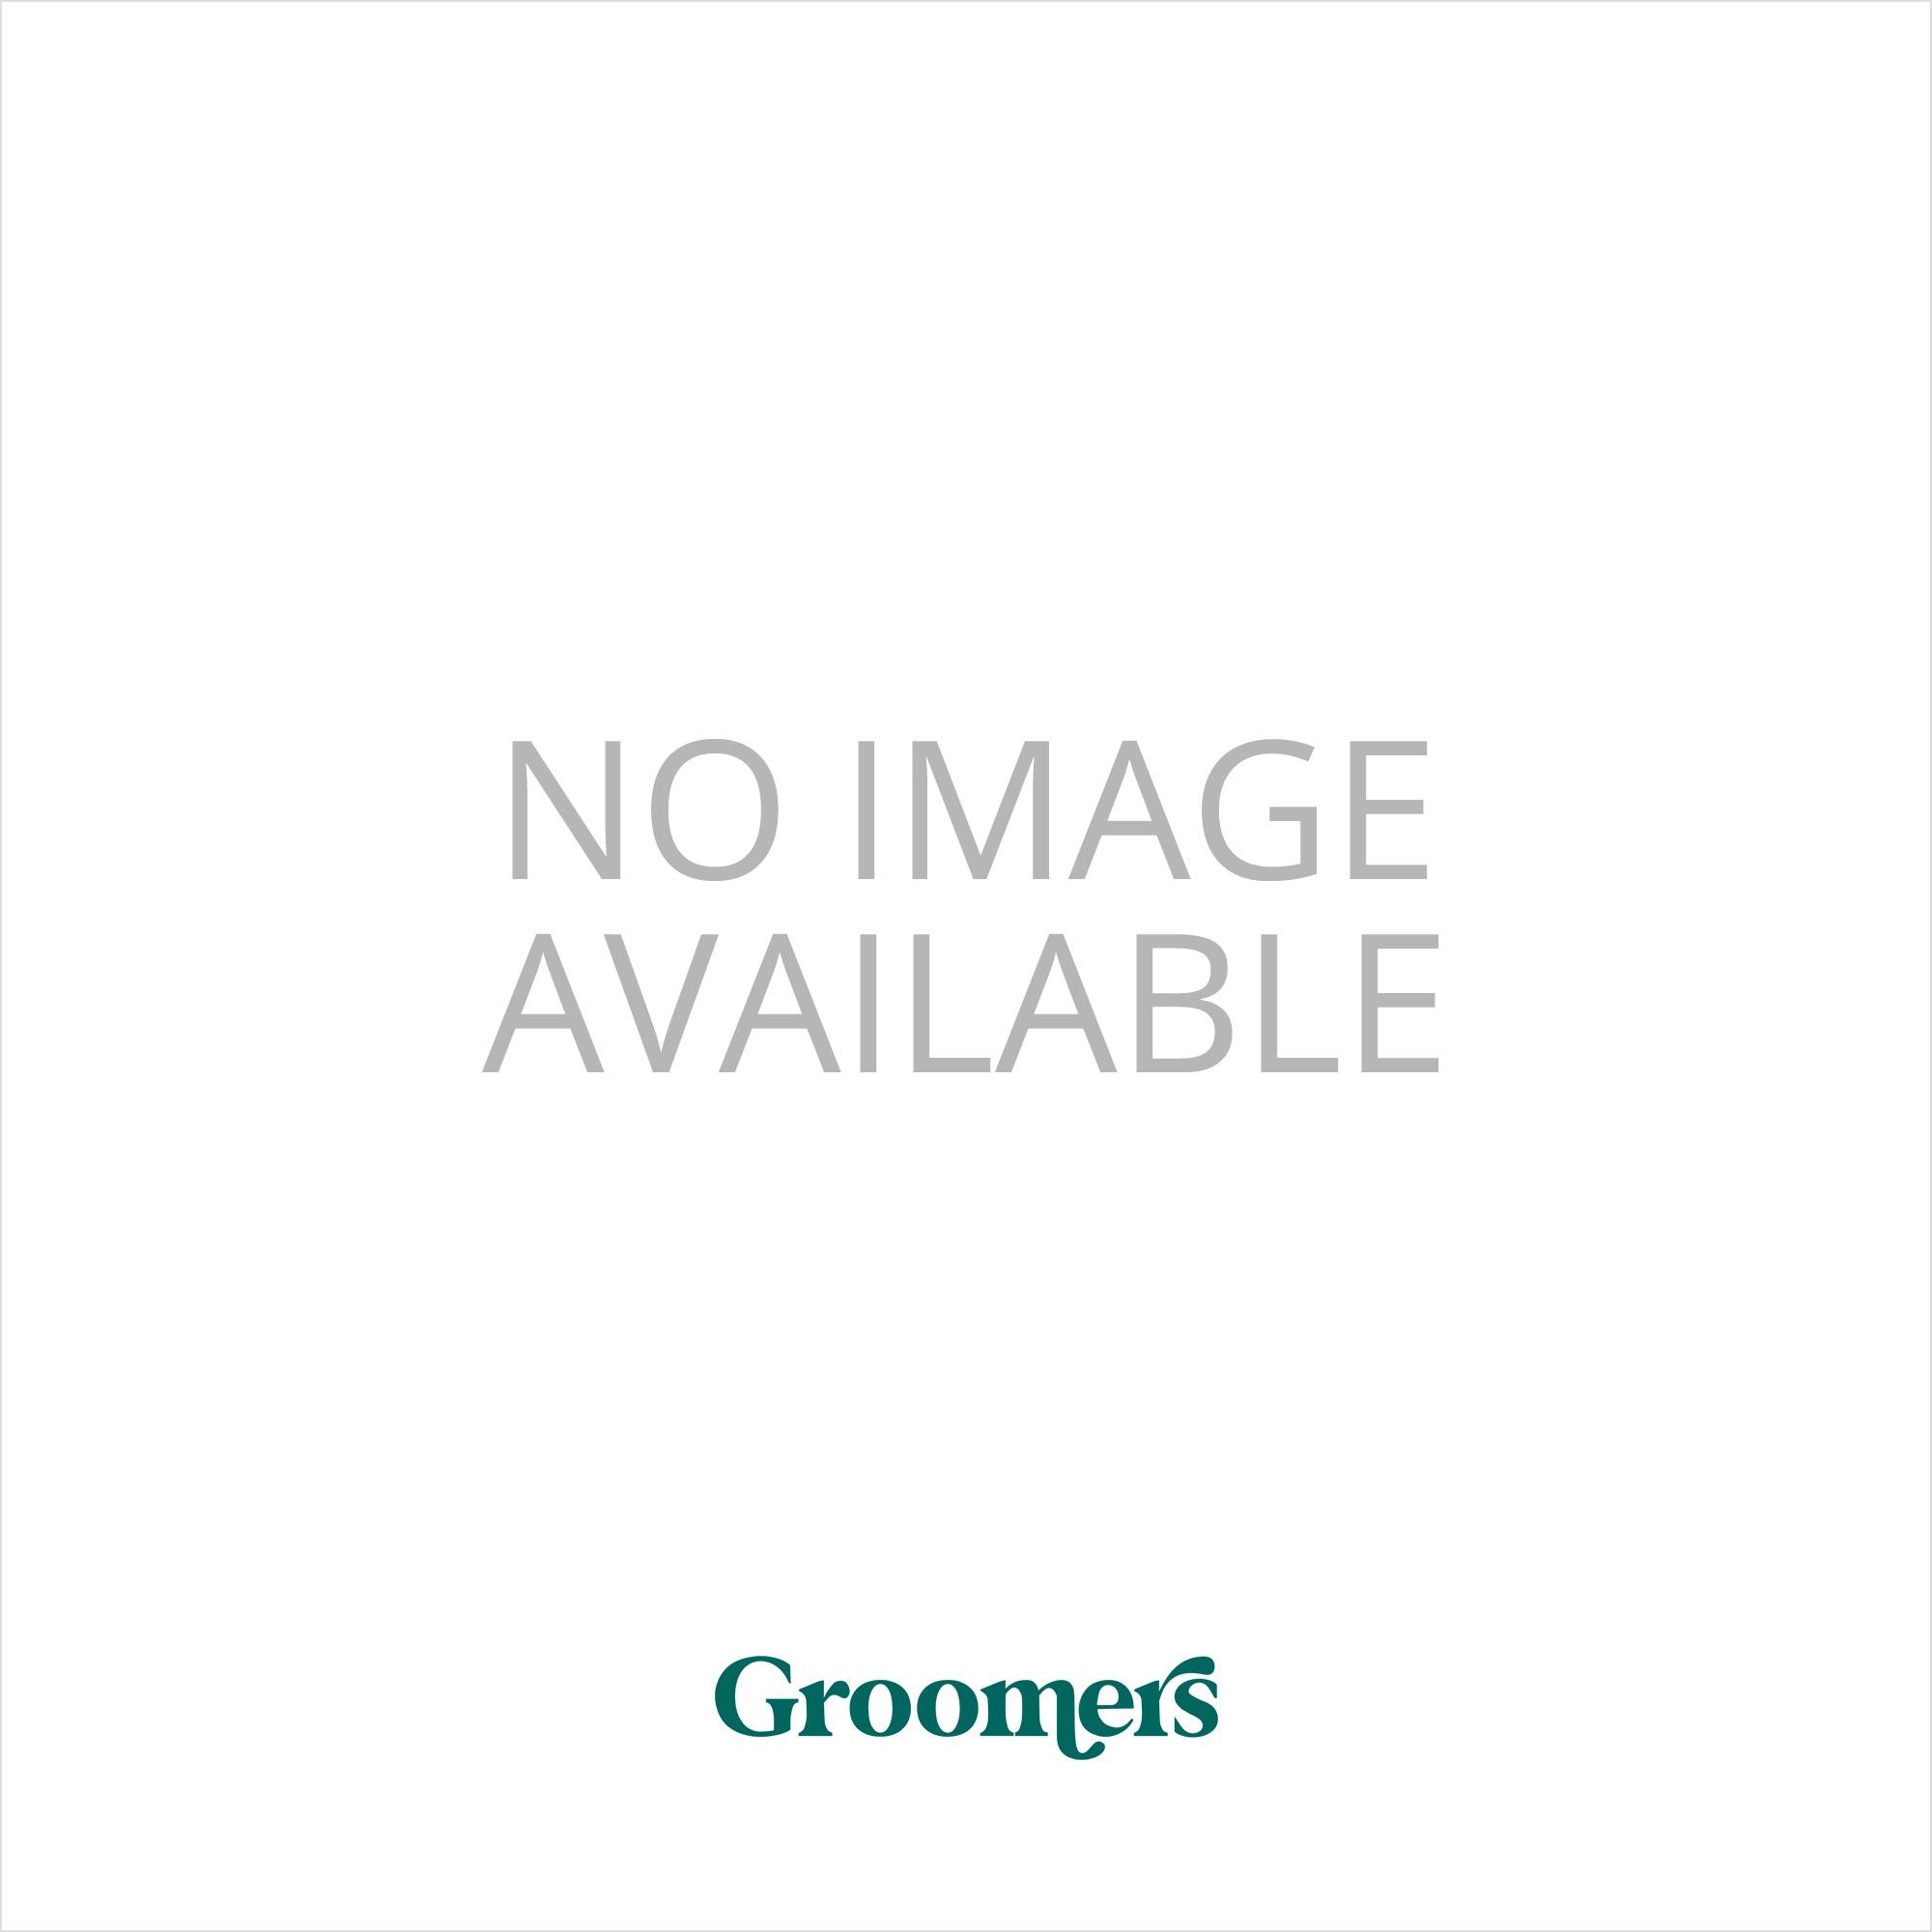 Groomers Equine Quick Wash Self-Rinse Shampoo